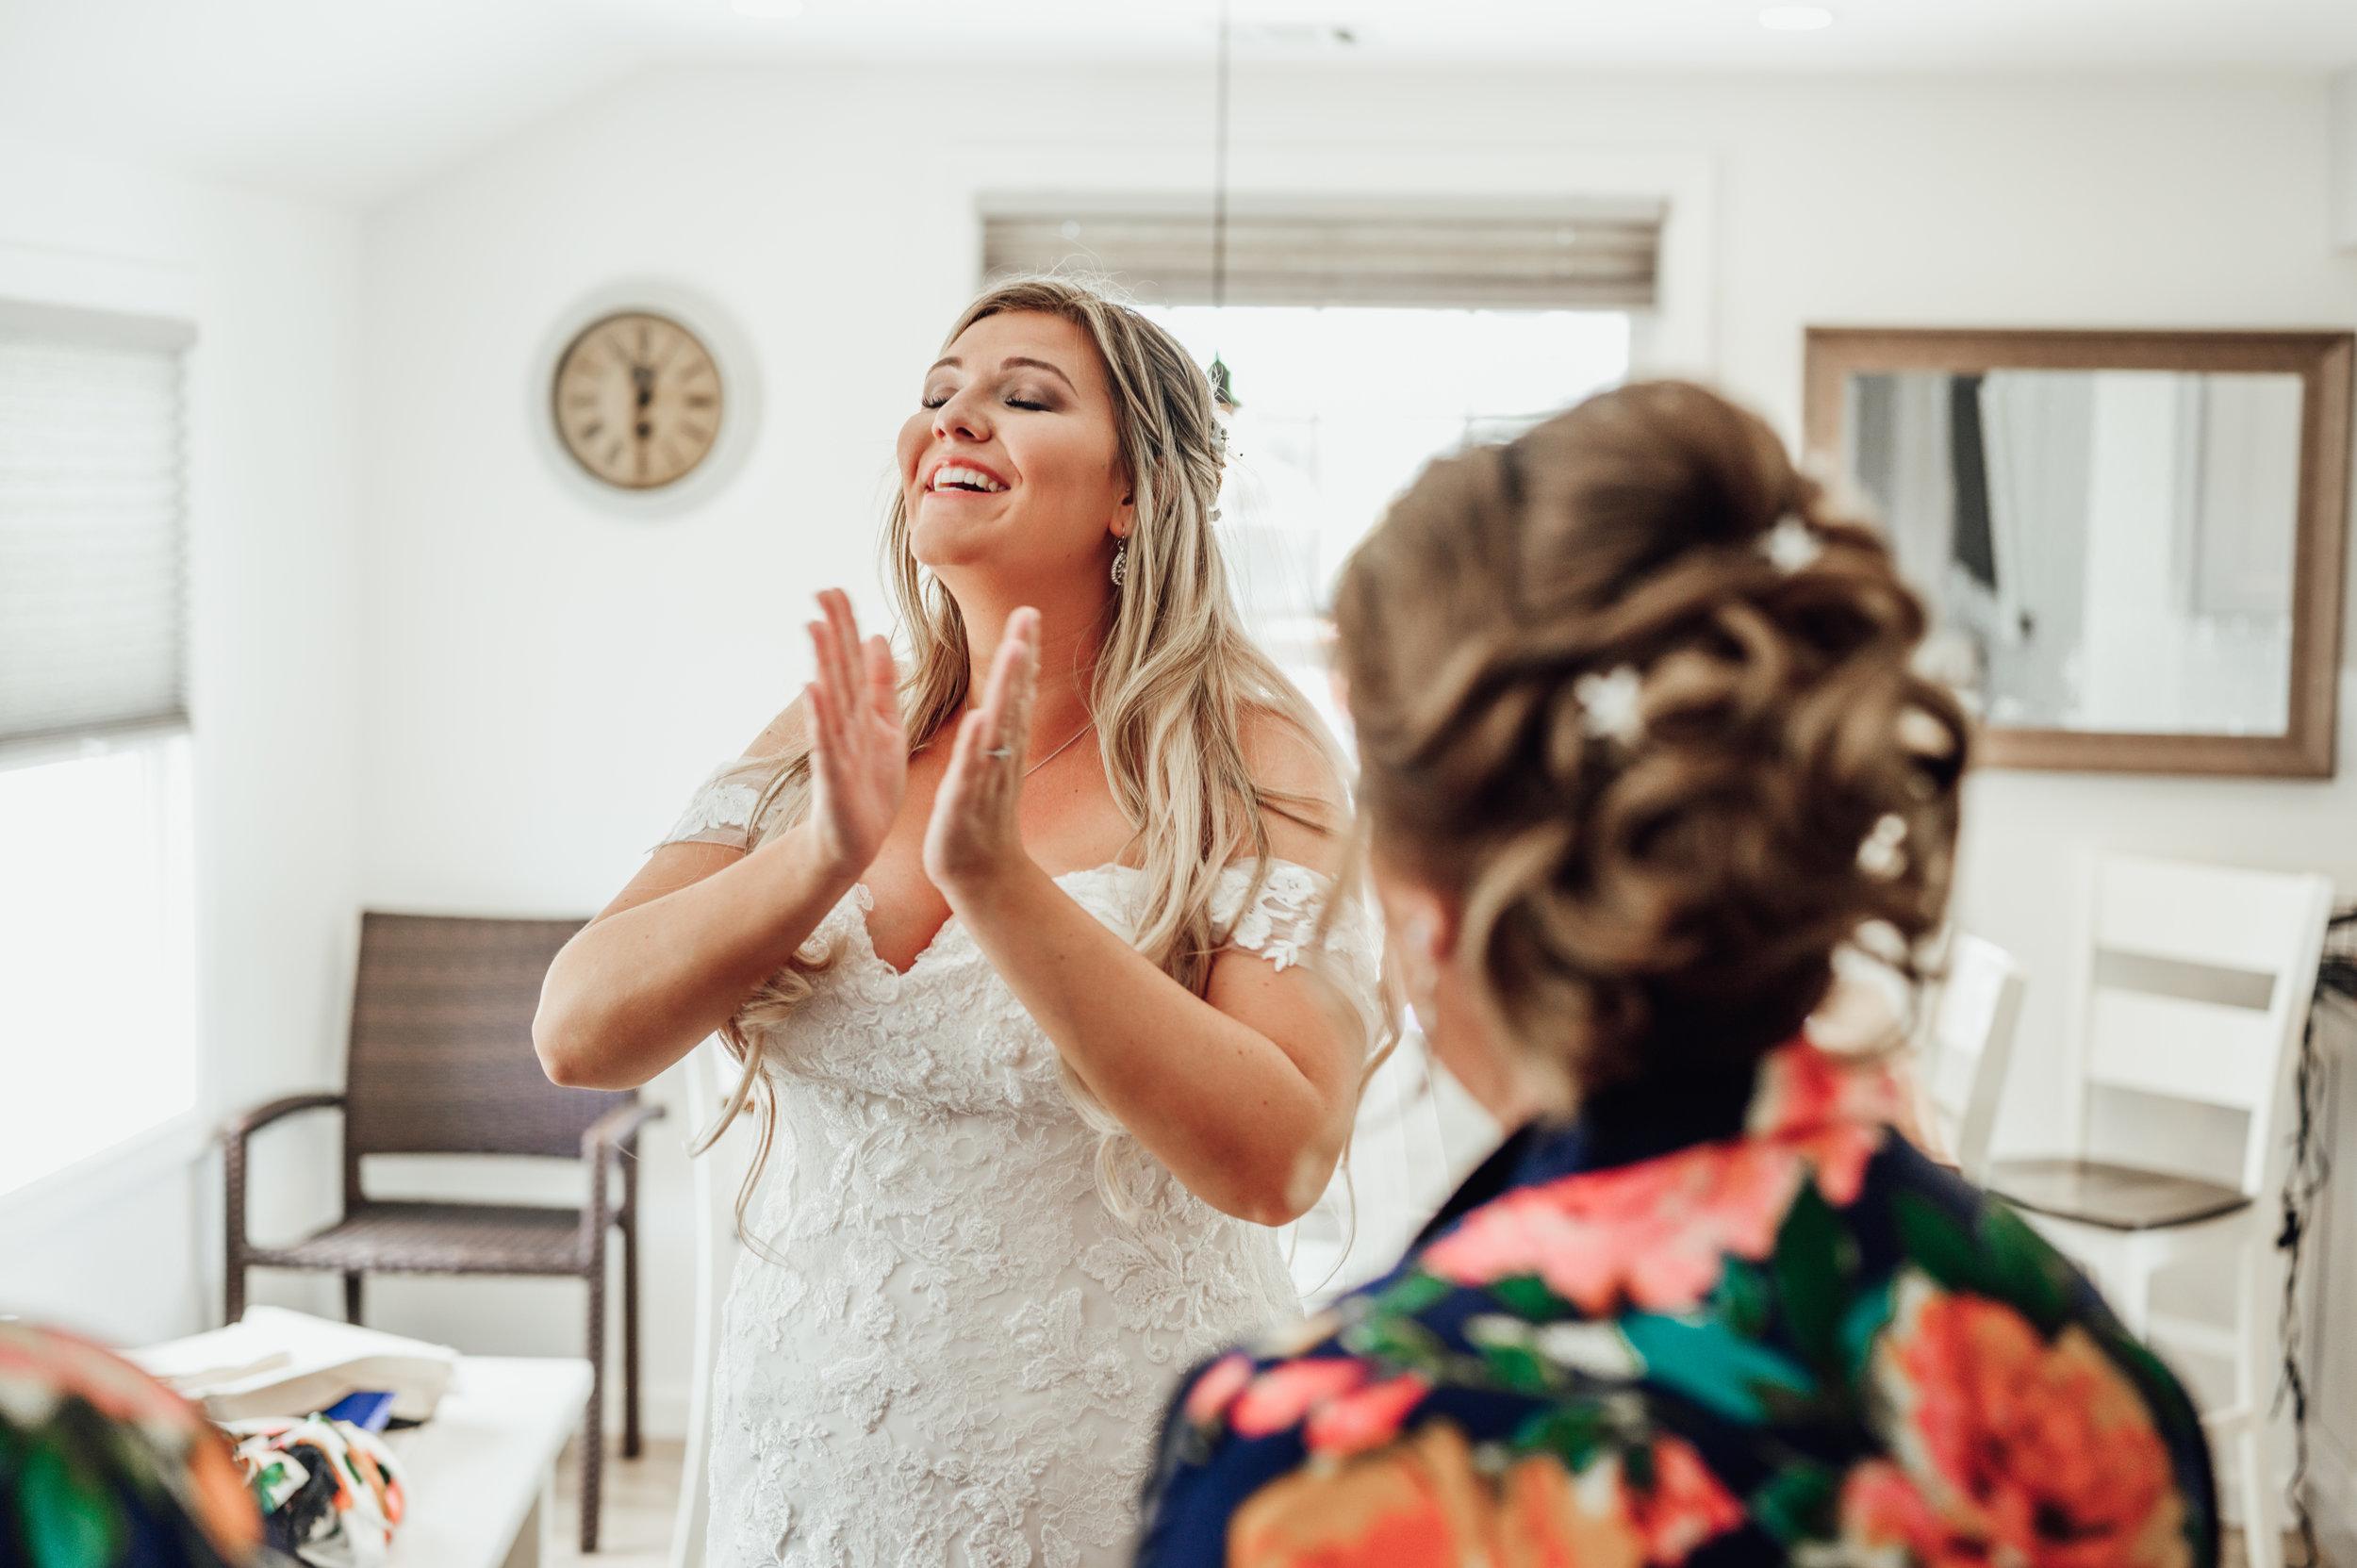 New Jersey Wedding Photographer, Felsberg Photography LBI wedding photography 32.jpg